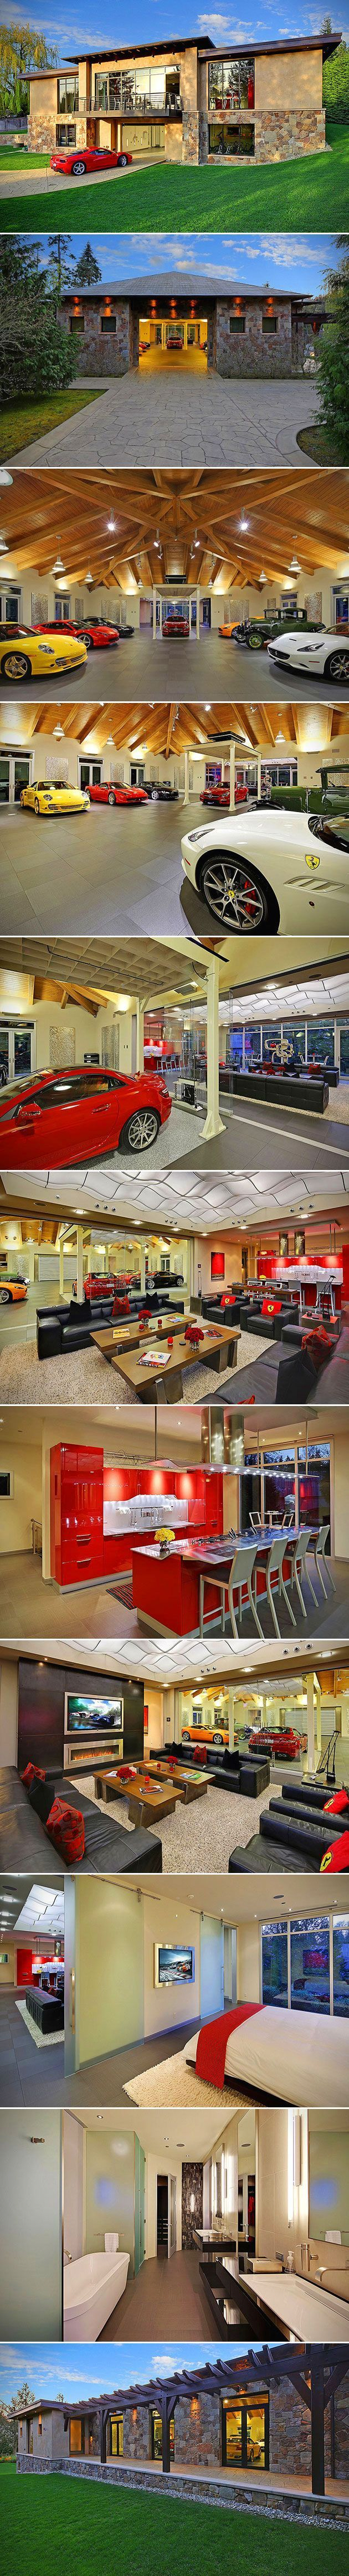 #luxurycars #50+ #house #luxury  50+ house luxury cars best photos